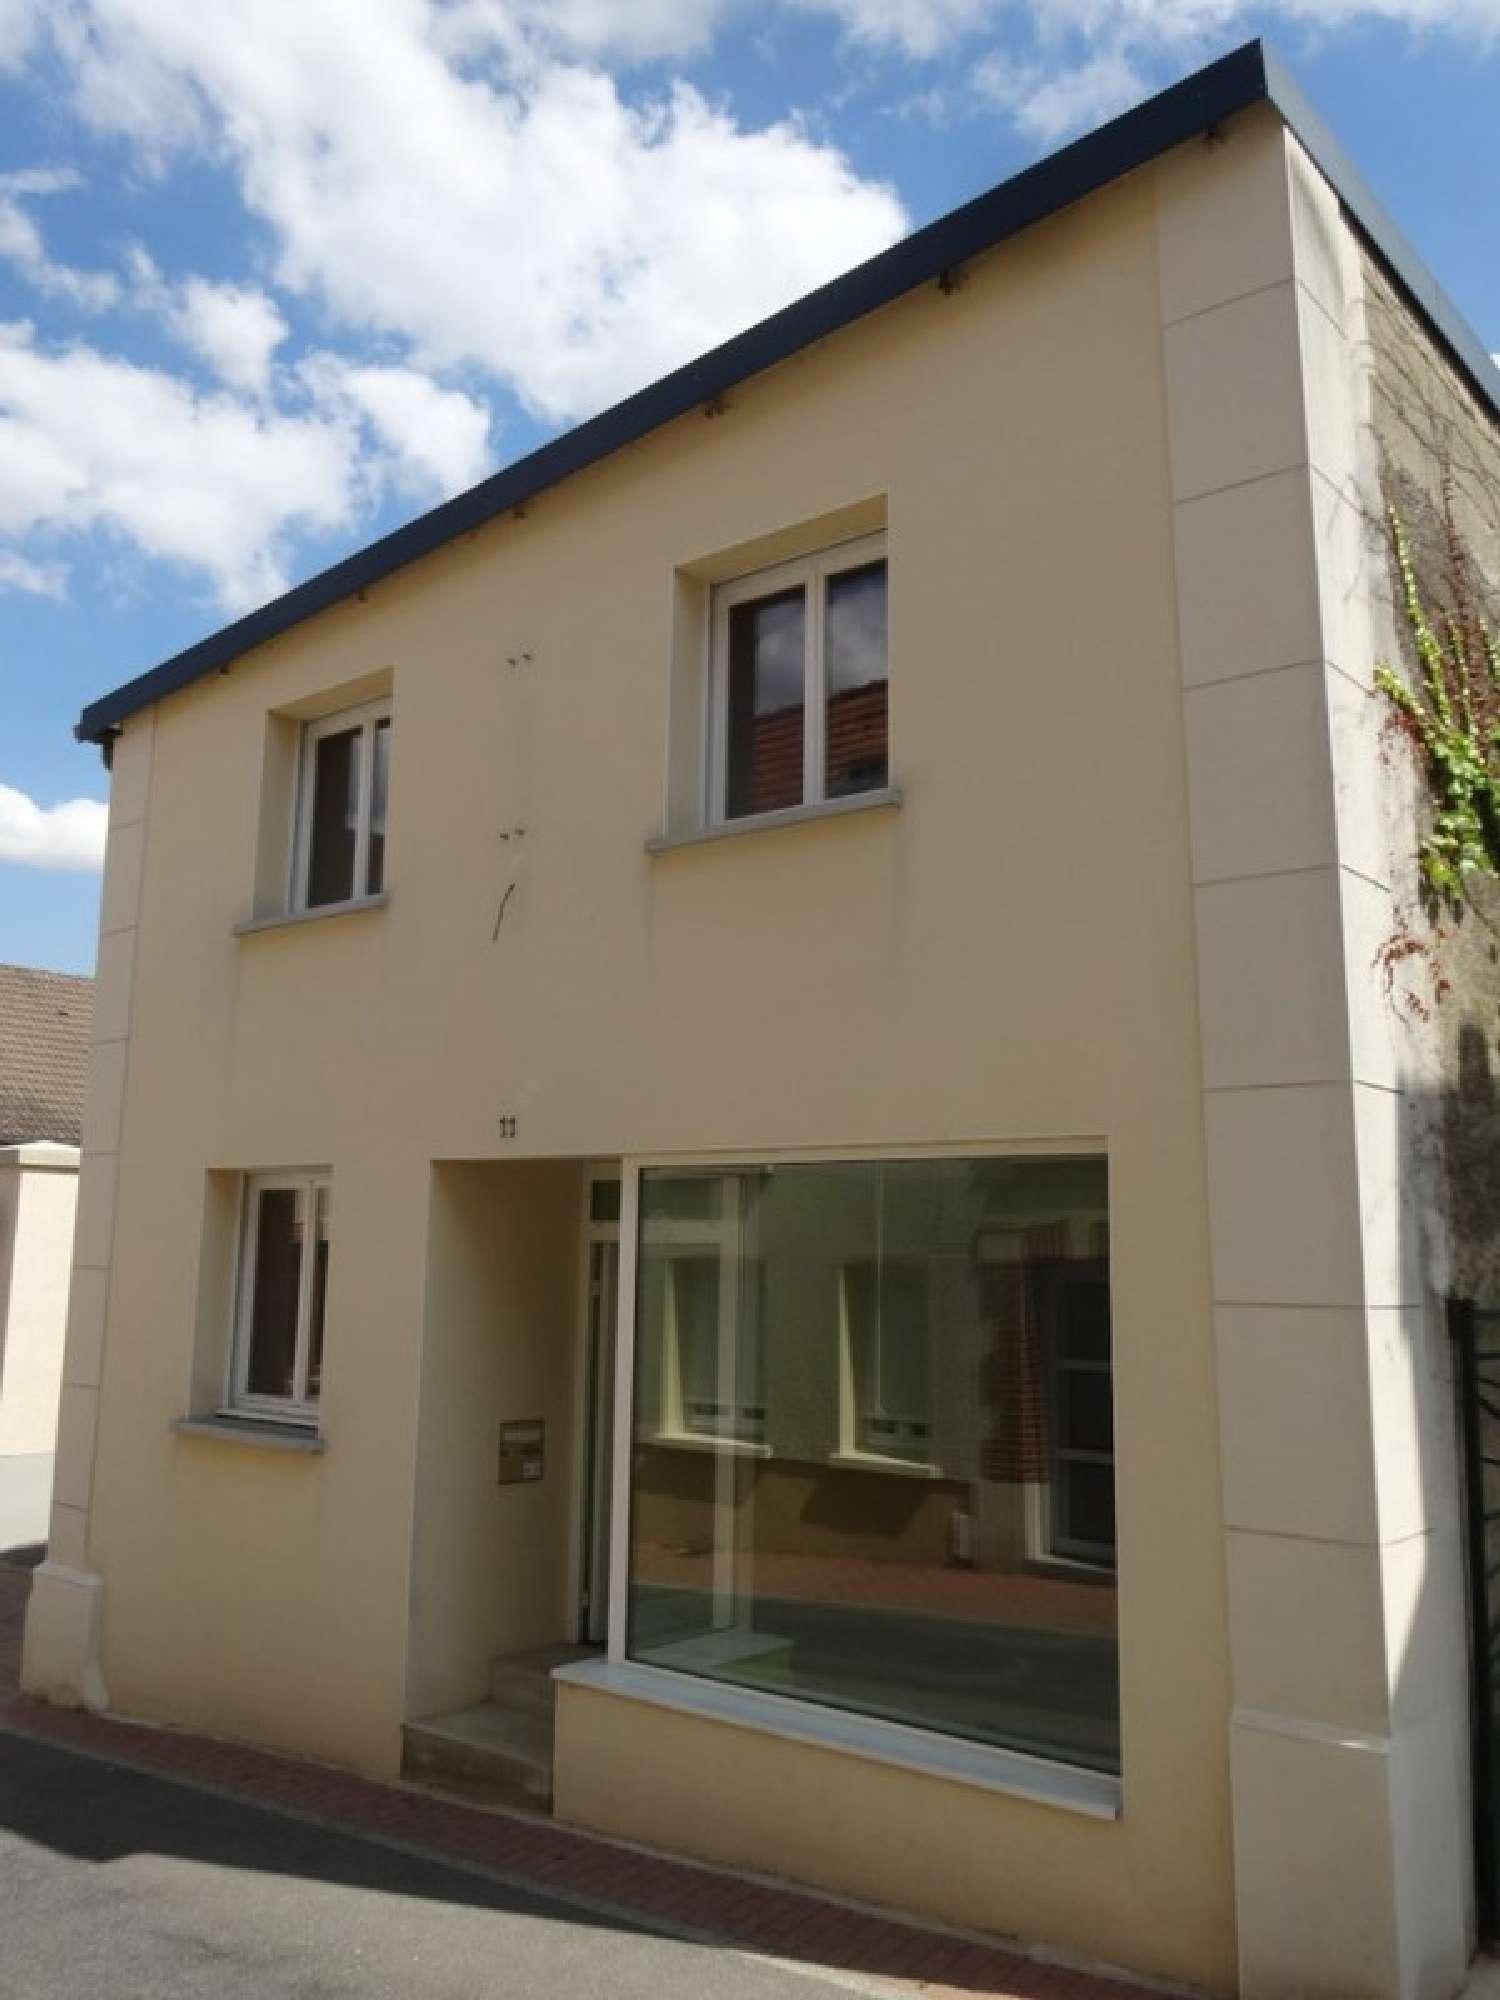 Avize Marne huis foto 4309519